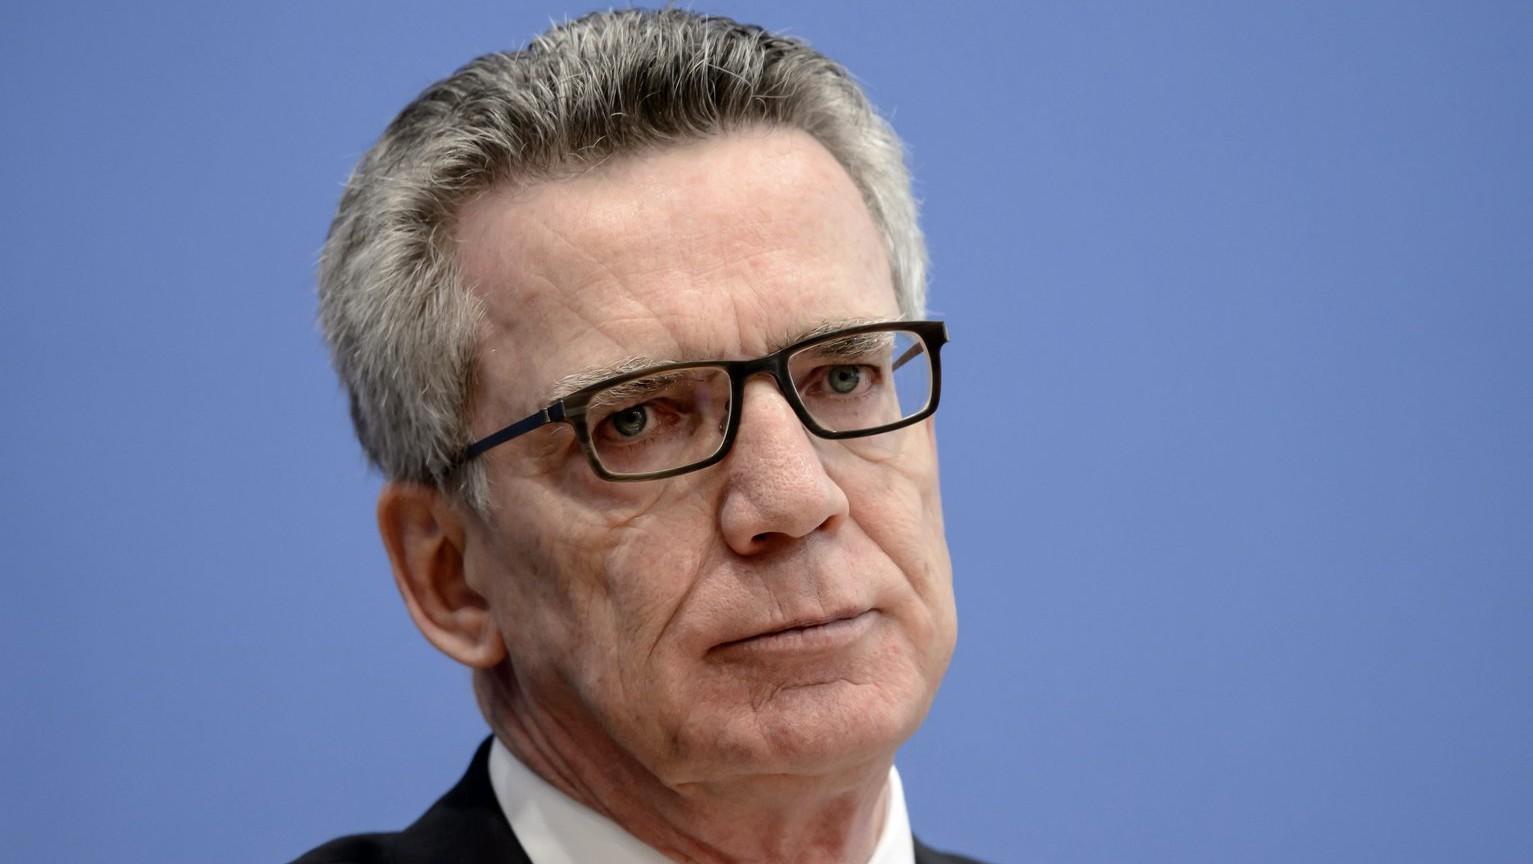 Thomas de Maiziere, német belügyminiszter (Fotó: MTI/EPA/Clemens Bilan)